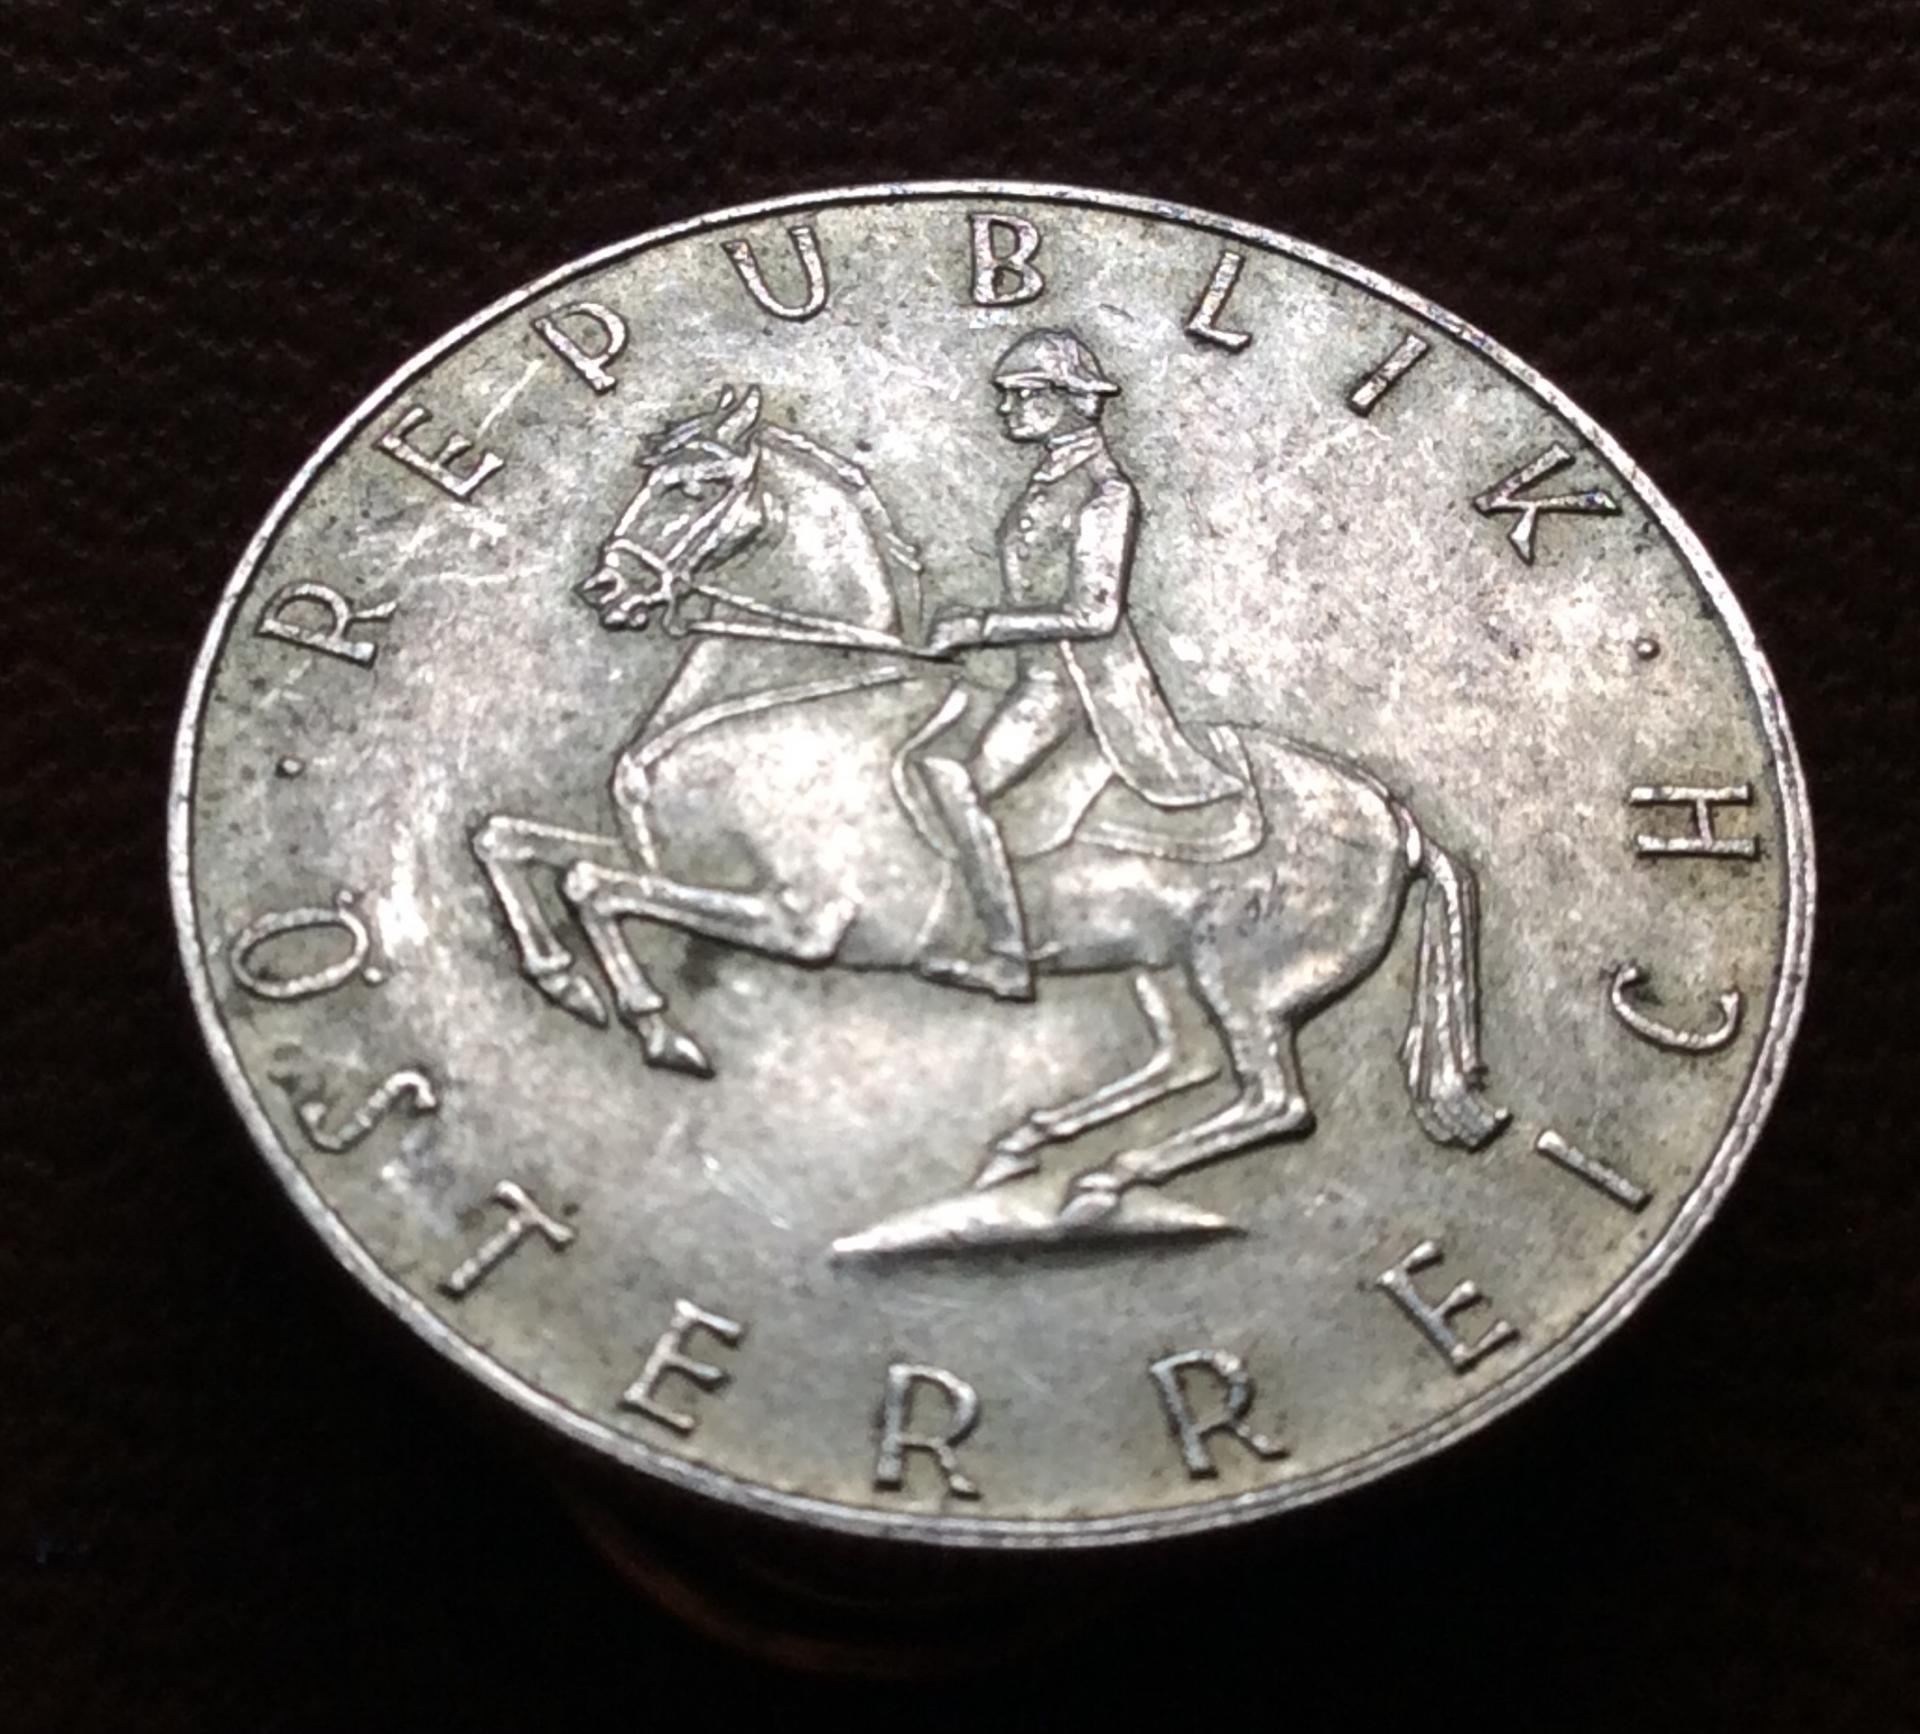 5 SCHILLING DE PLATA DE 1962 - REPUBLICA AUSTRIACA - SIN CIRCULAR